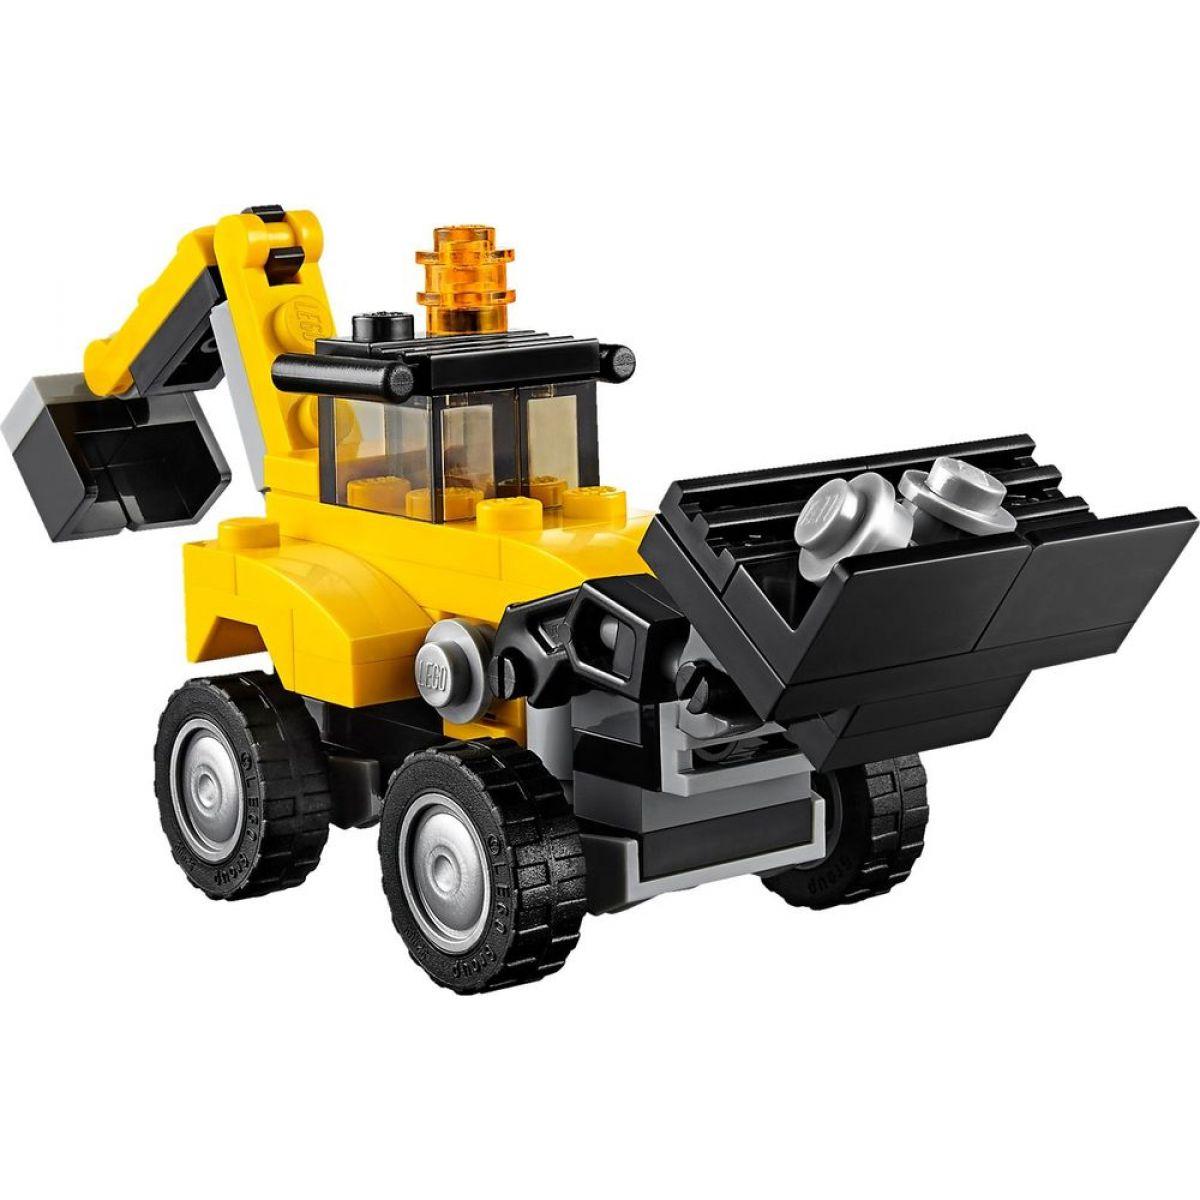 LEGO Creator 31041 Vozidla na stavbě #2